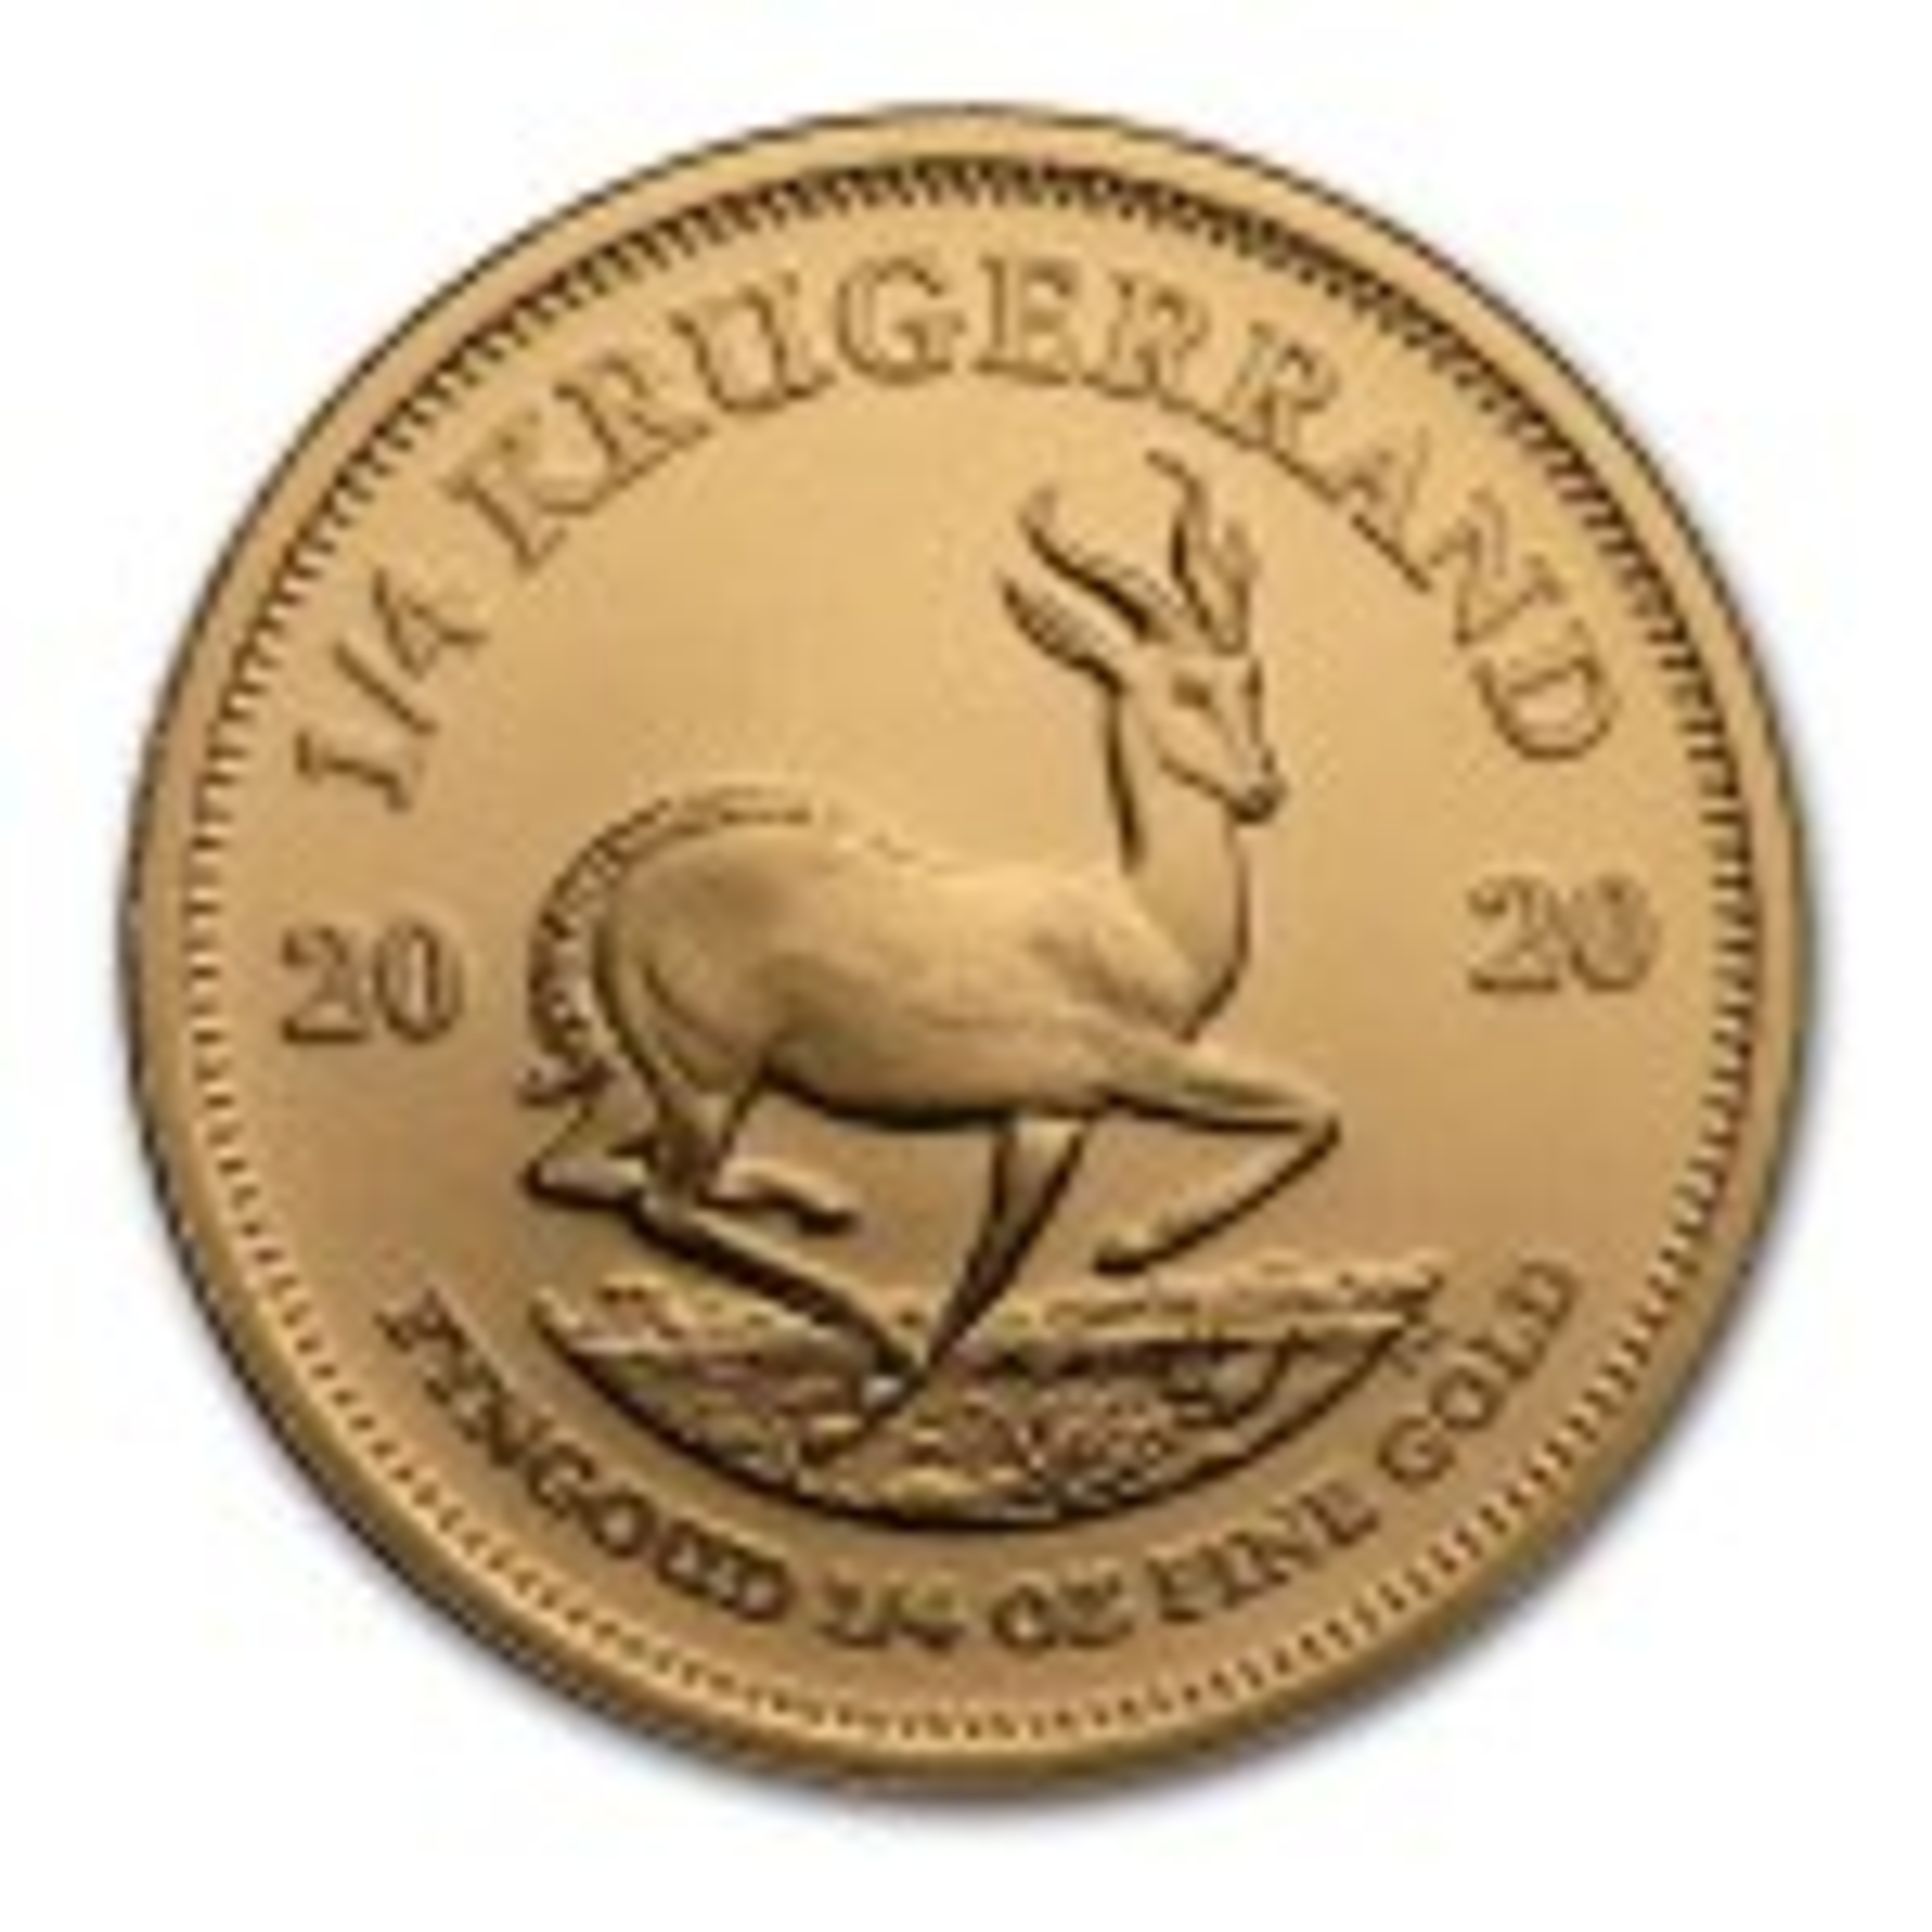 1/4 Troy ounce gold Krugerrand coin 2020